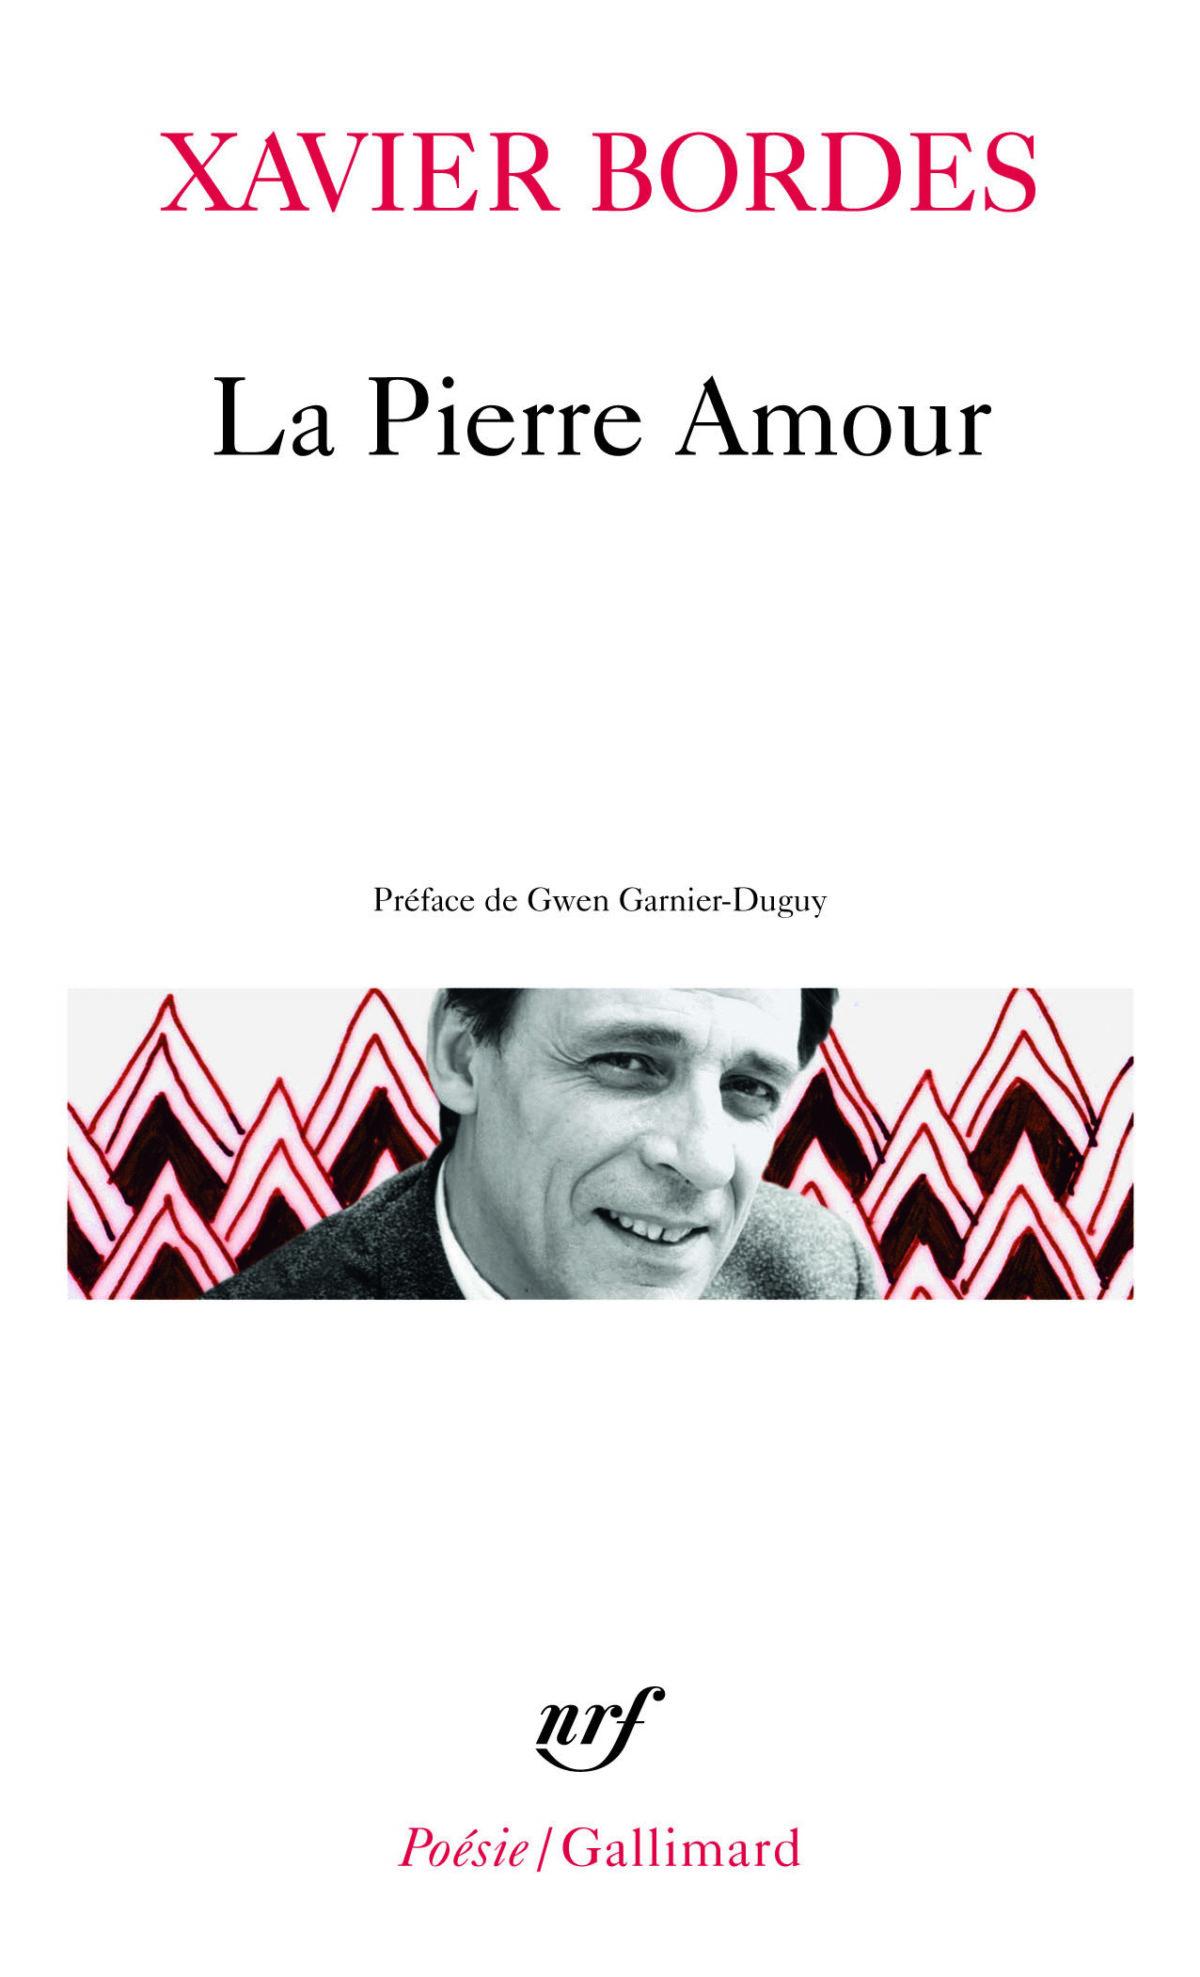 Xavier Bordes, La Pierre Amour, collection Poésie/Gallimard